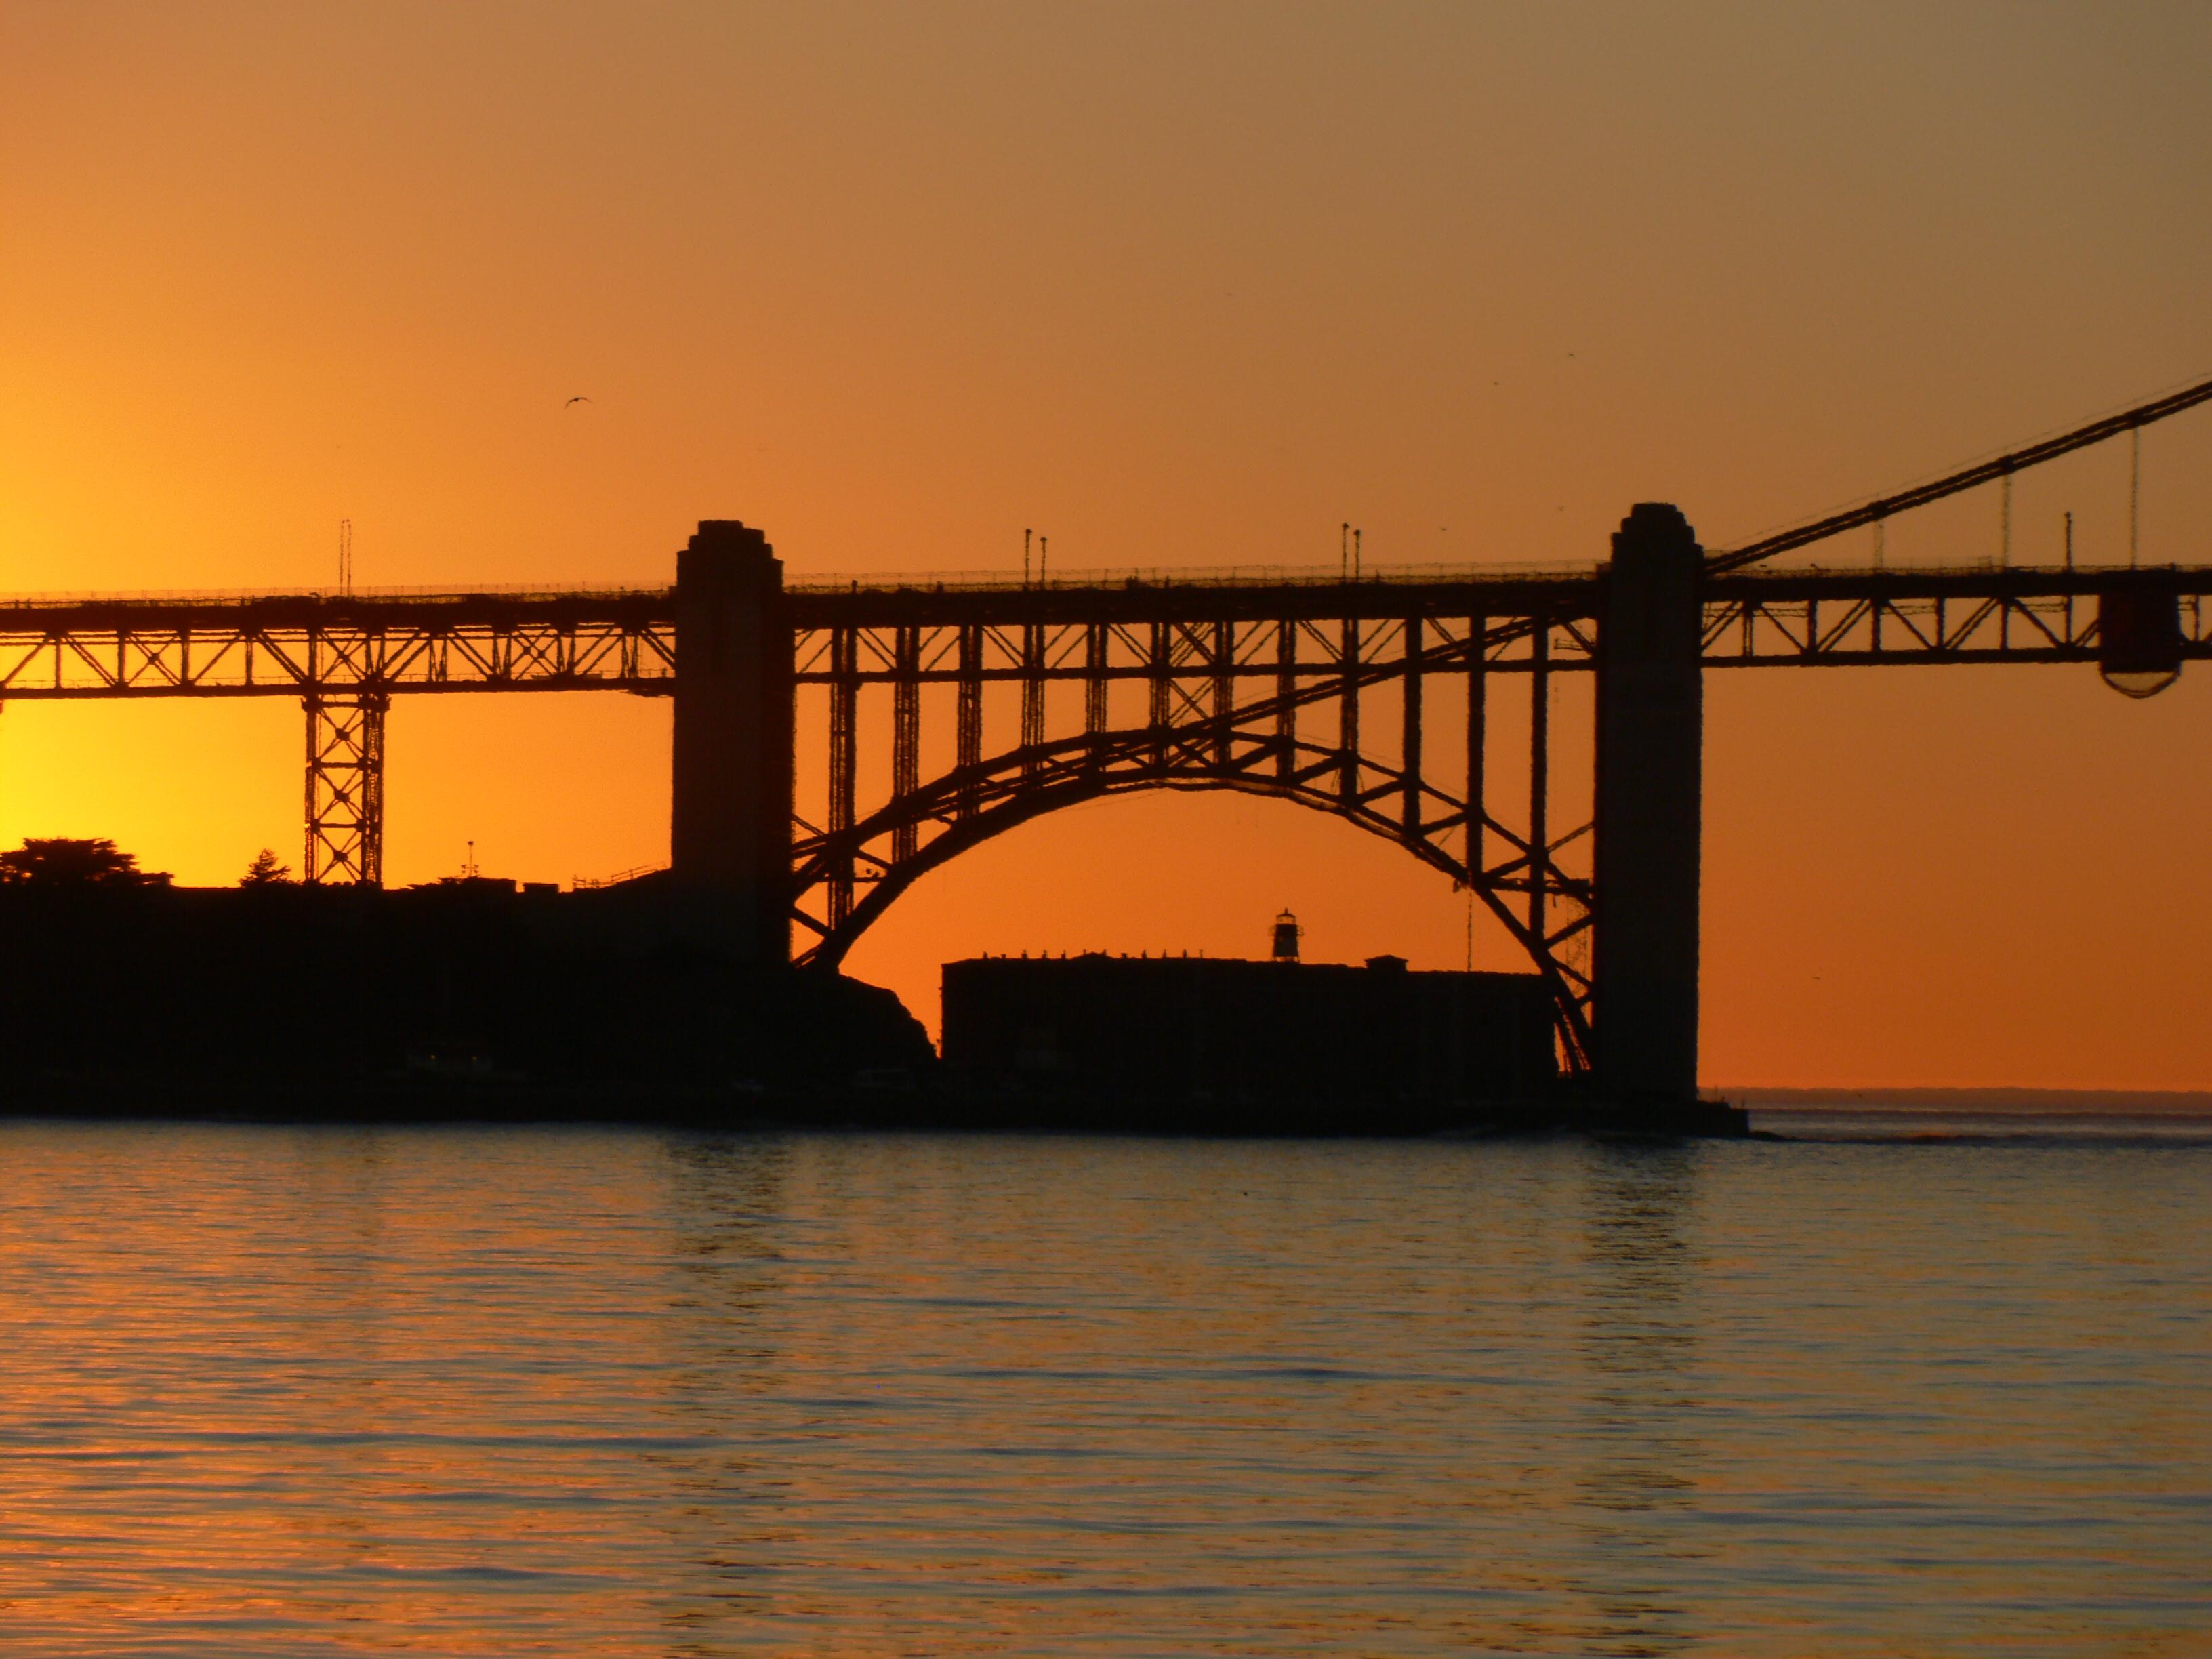 San francisco bay (14) photo